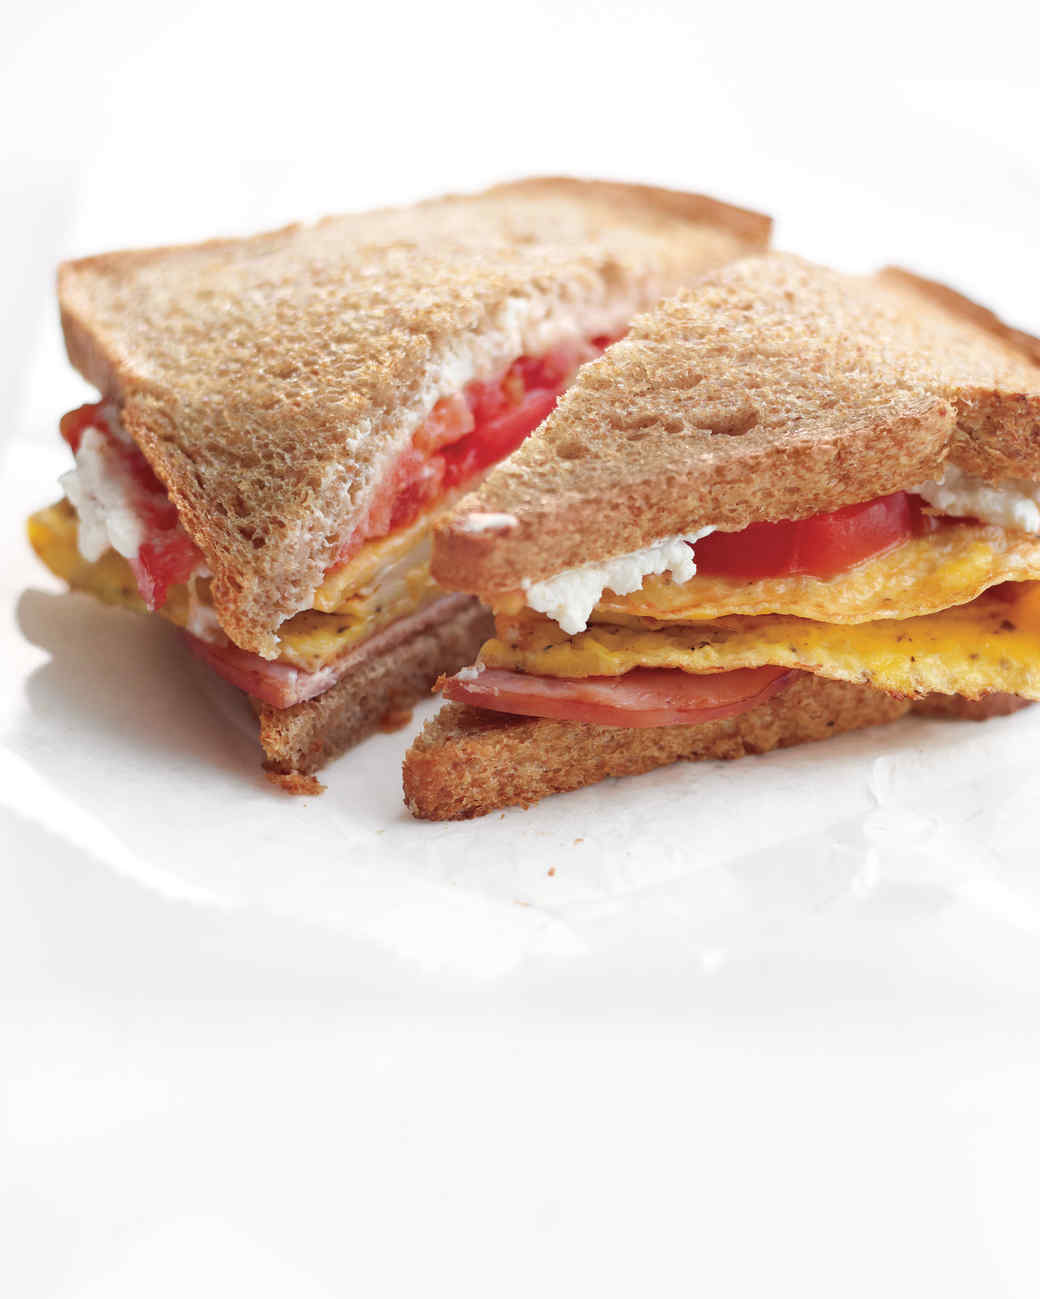 bacon-egg-cheese-sandwich-med108588.jpg